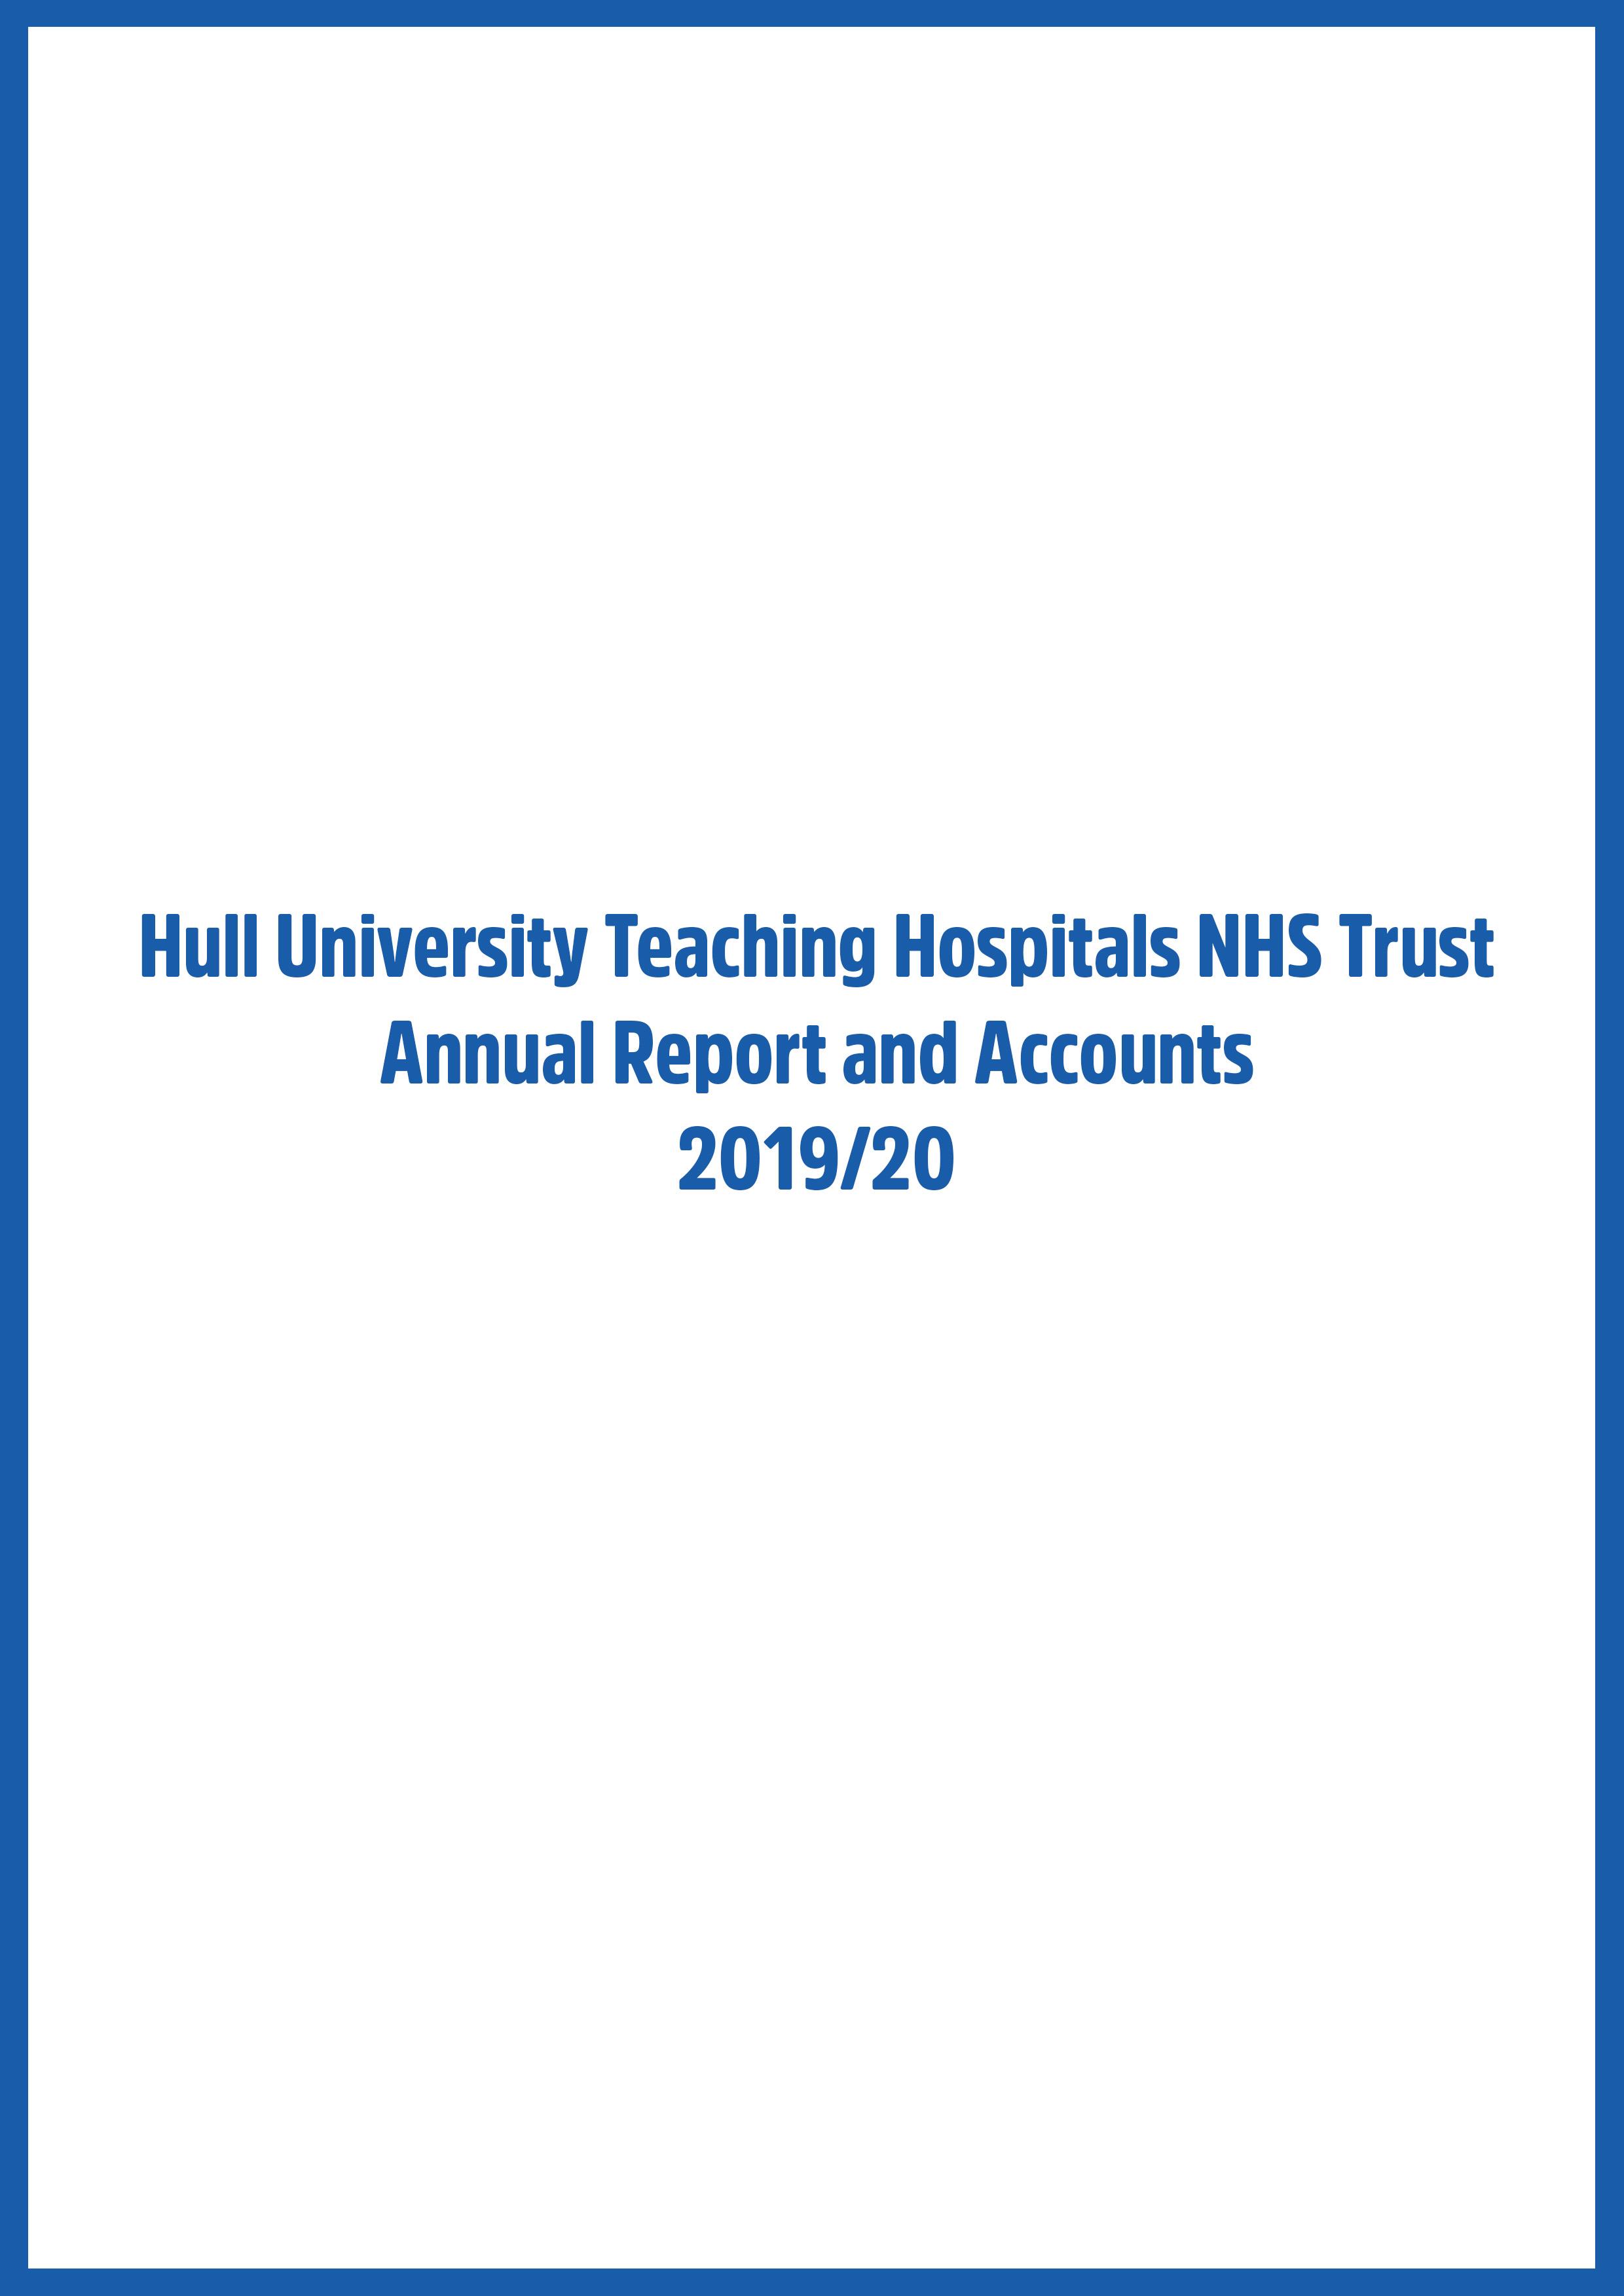 Annual Report 2012-2020